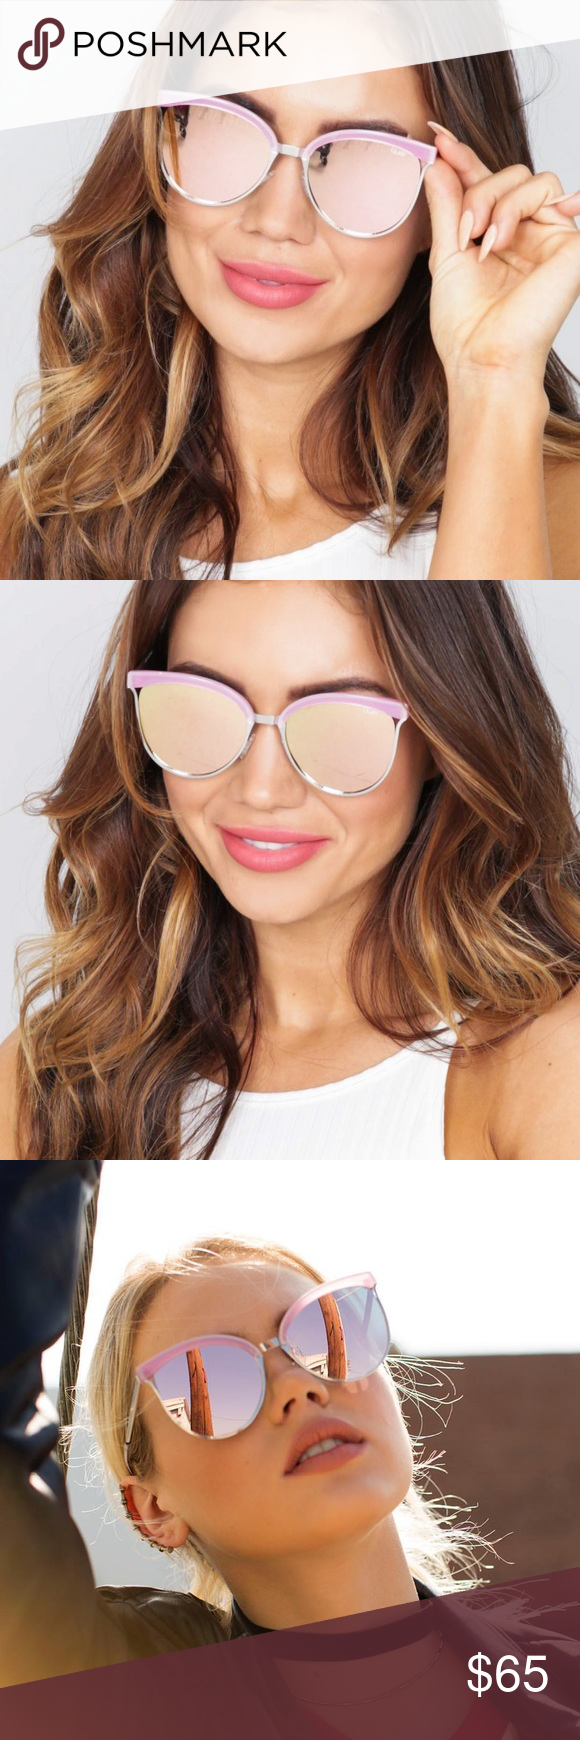 Quay Australia Black My Girl Cateye Sunglasses $65 NEW   eBay